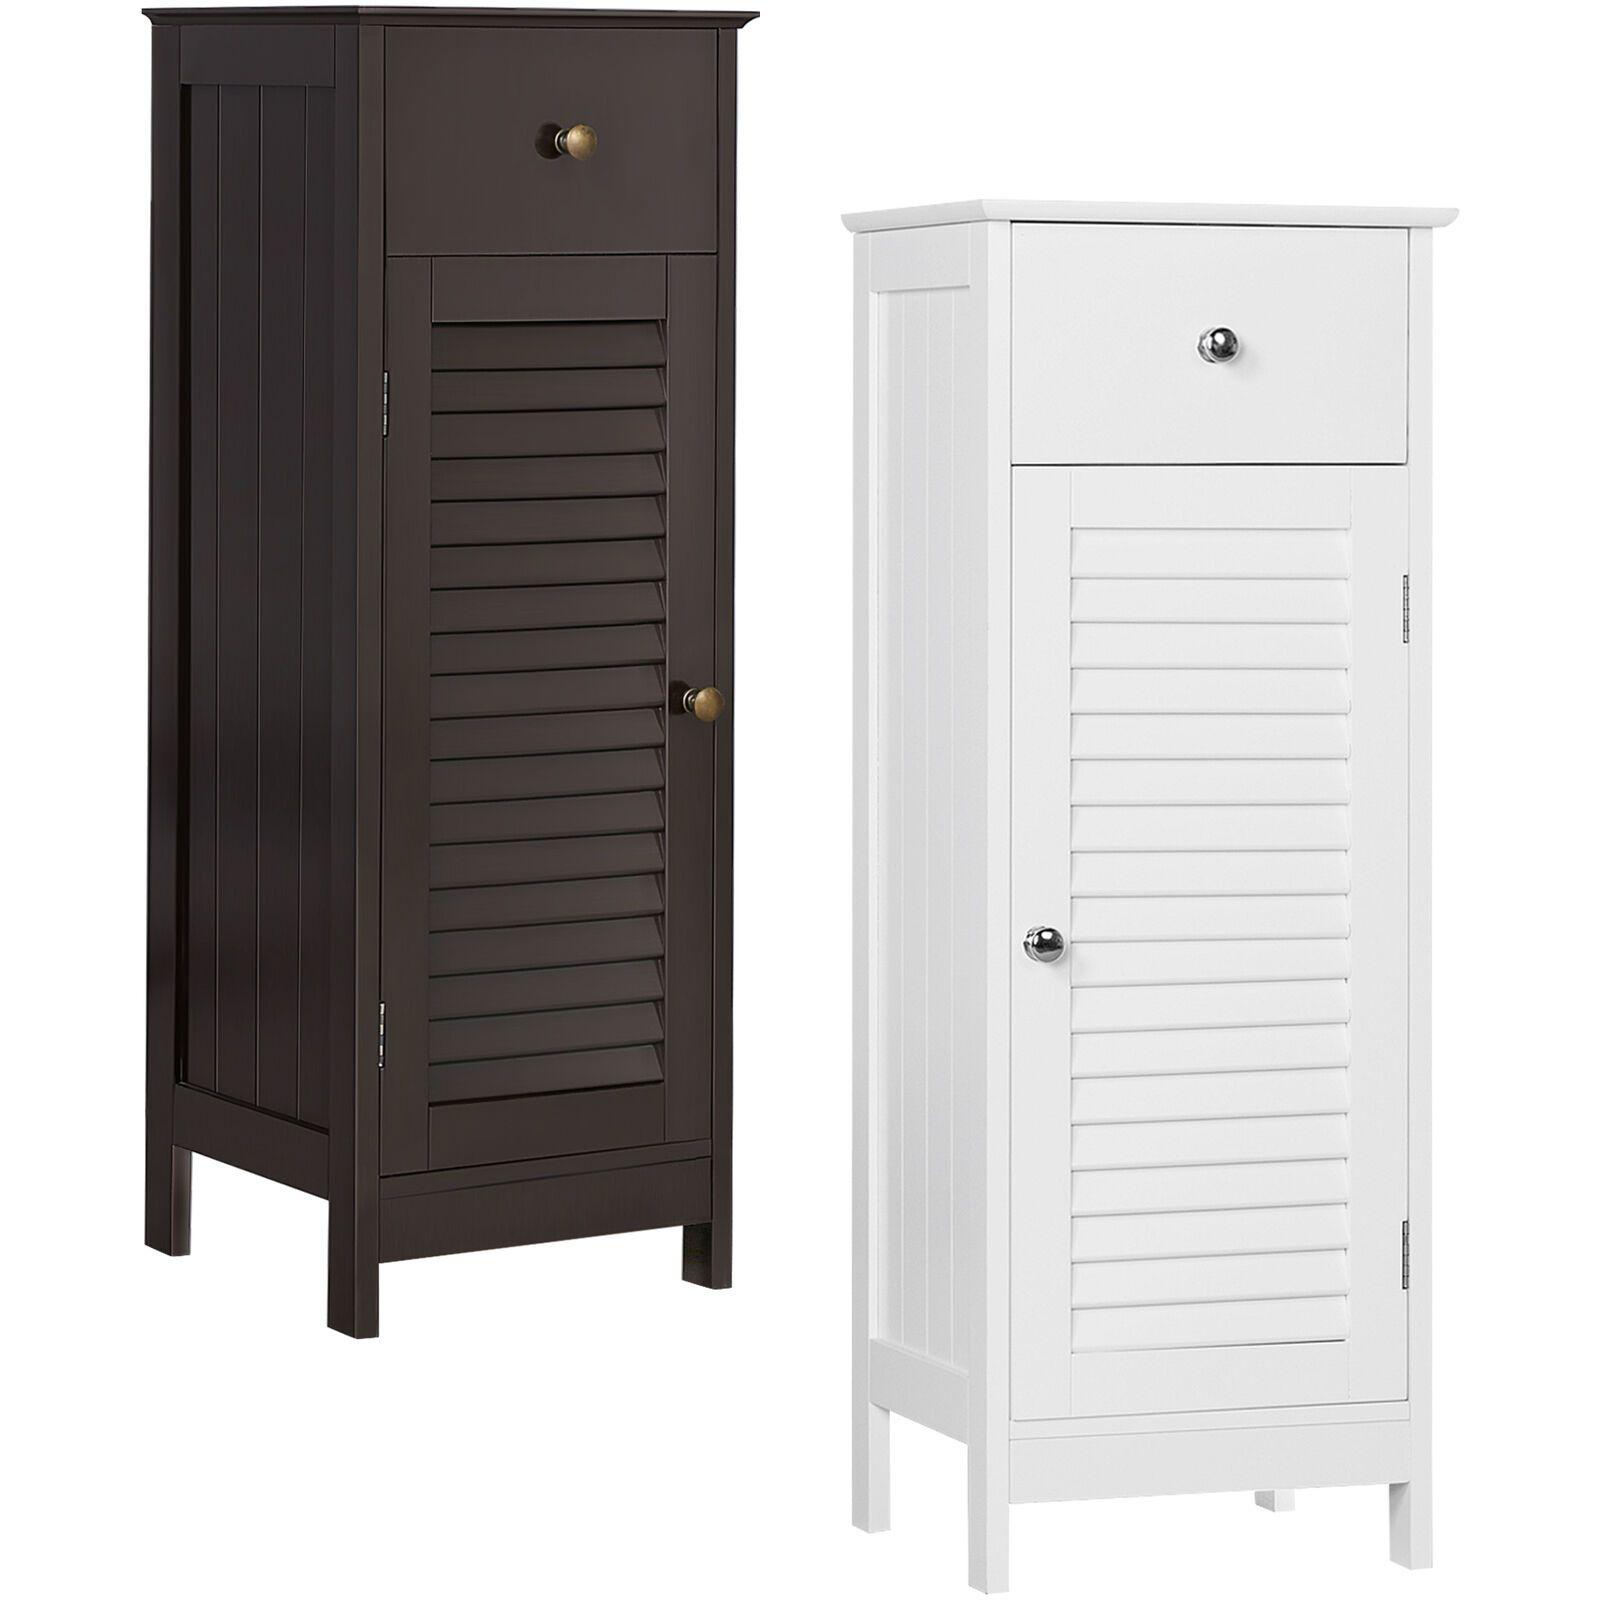 Wood Bathroom Floor Cabinet Storage Organizer Free Standing With Drawer And Door 59 99 Cool Bathroom Storage Ideas Of Bathro In 2020 Bathroom Floor Storage Cabinet